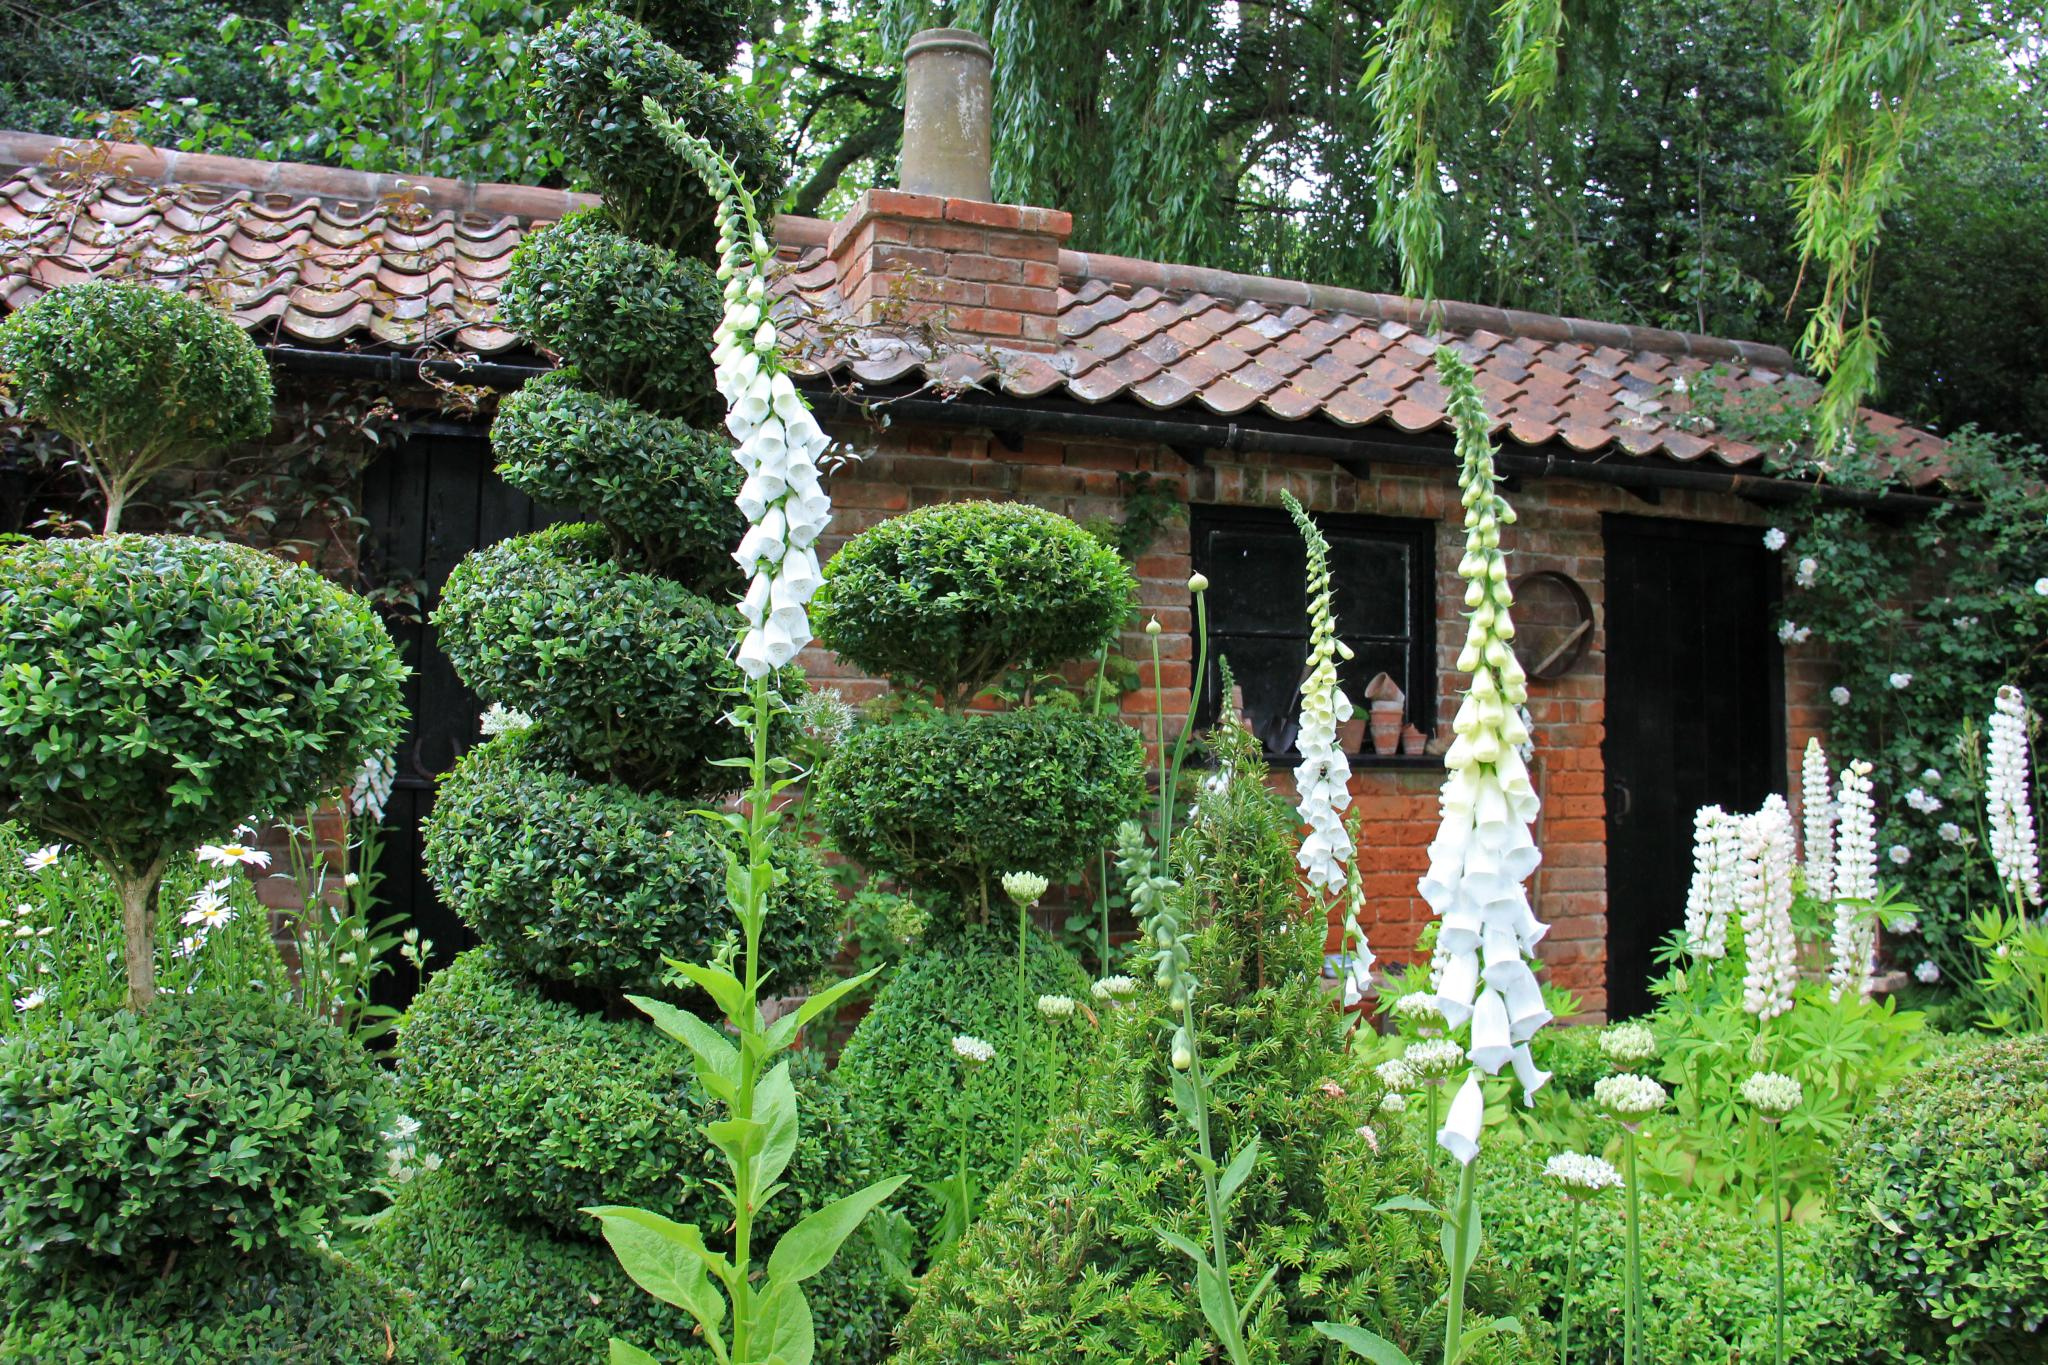 Garden Design Vacancies garden design vacancies: front yard landscaping plans shrubs